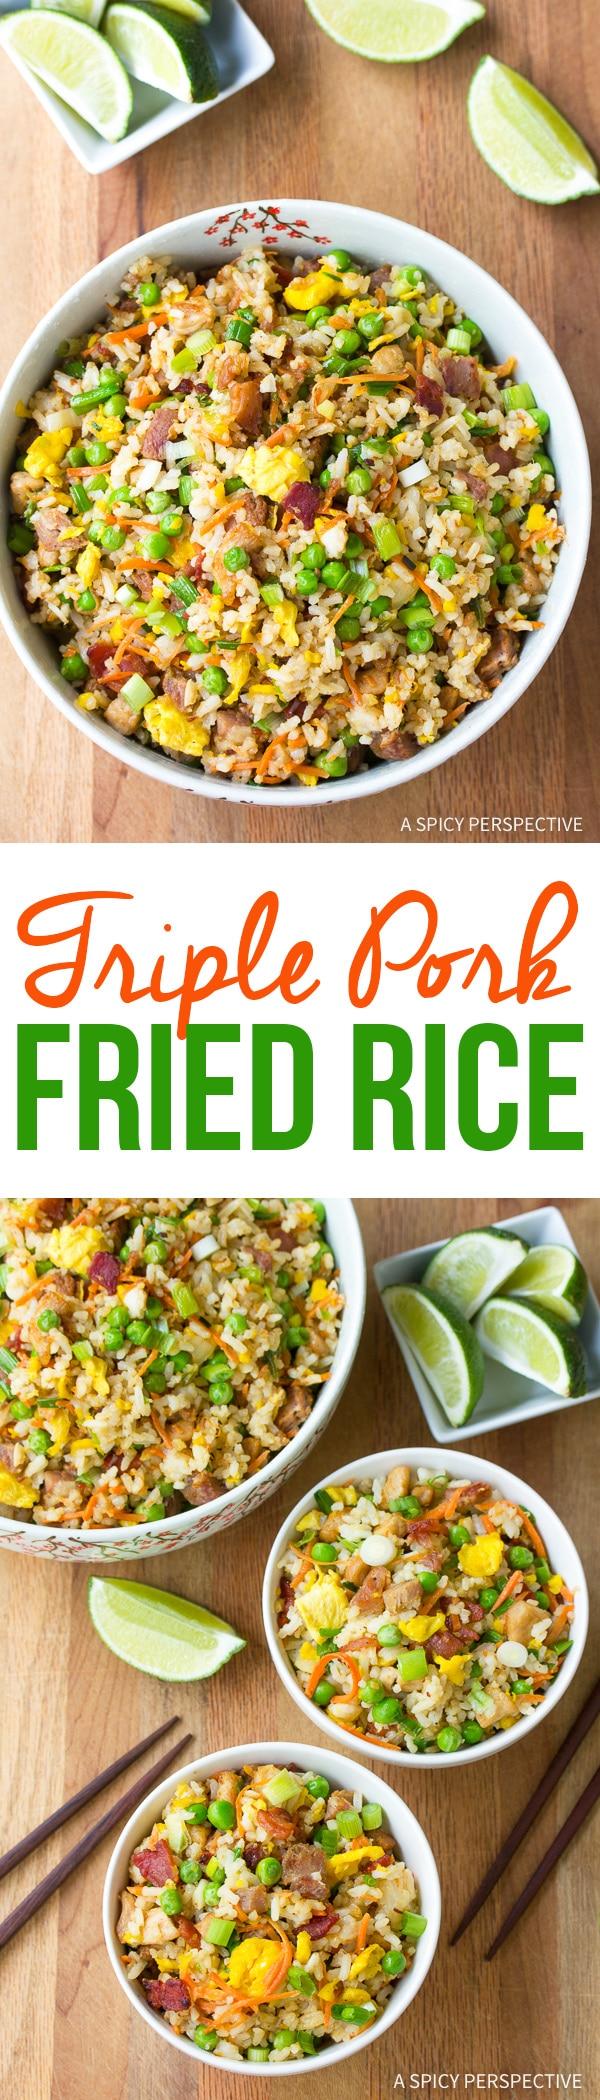 Hawaiian Triple Pork Fried Rice Recipe